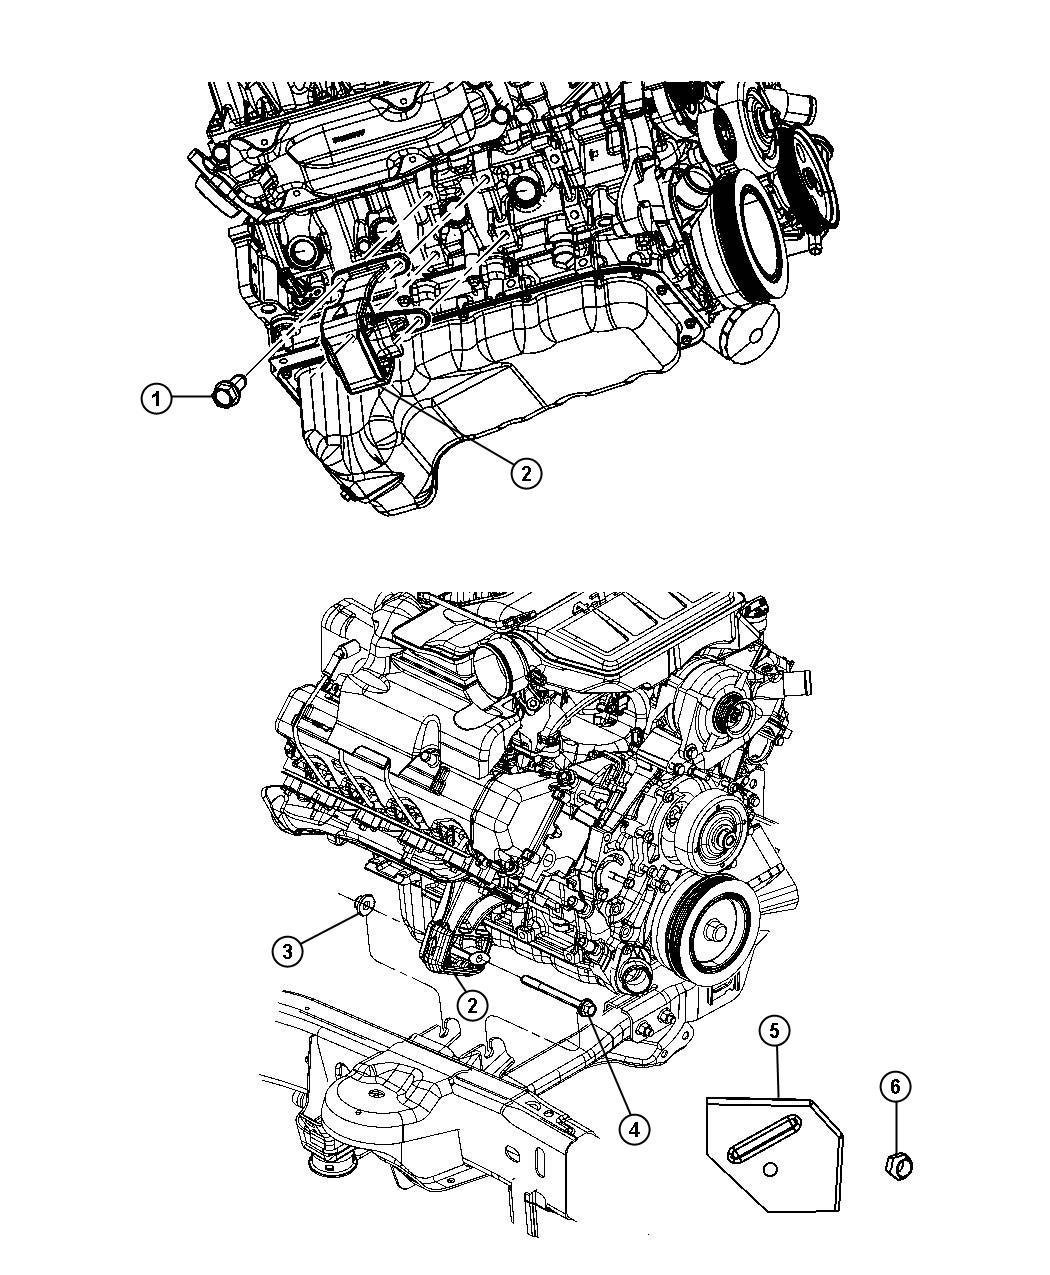 Dodge Ram 1500 Heat shield, shield. Engine mount. Left